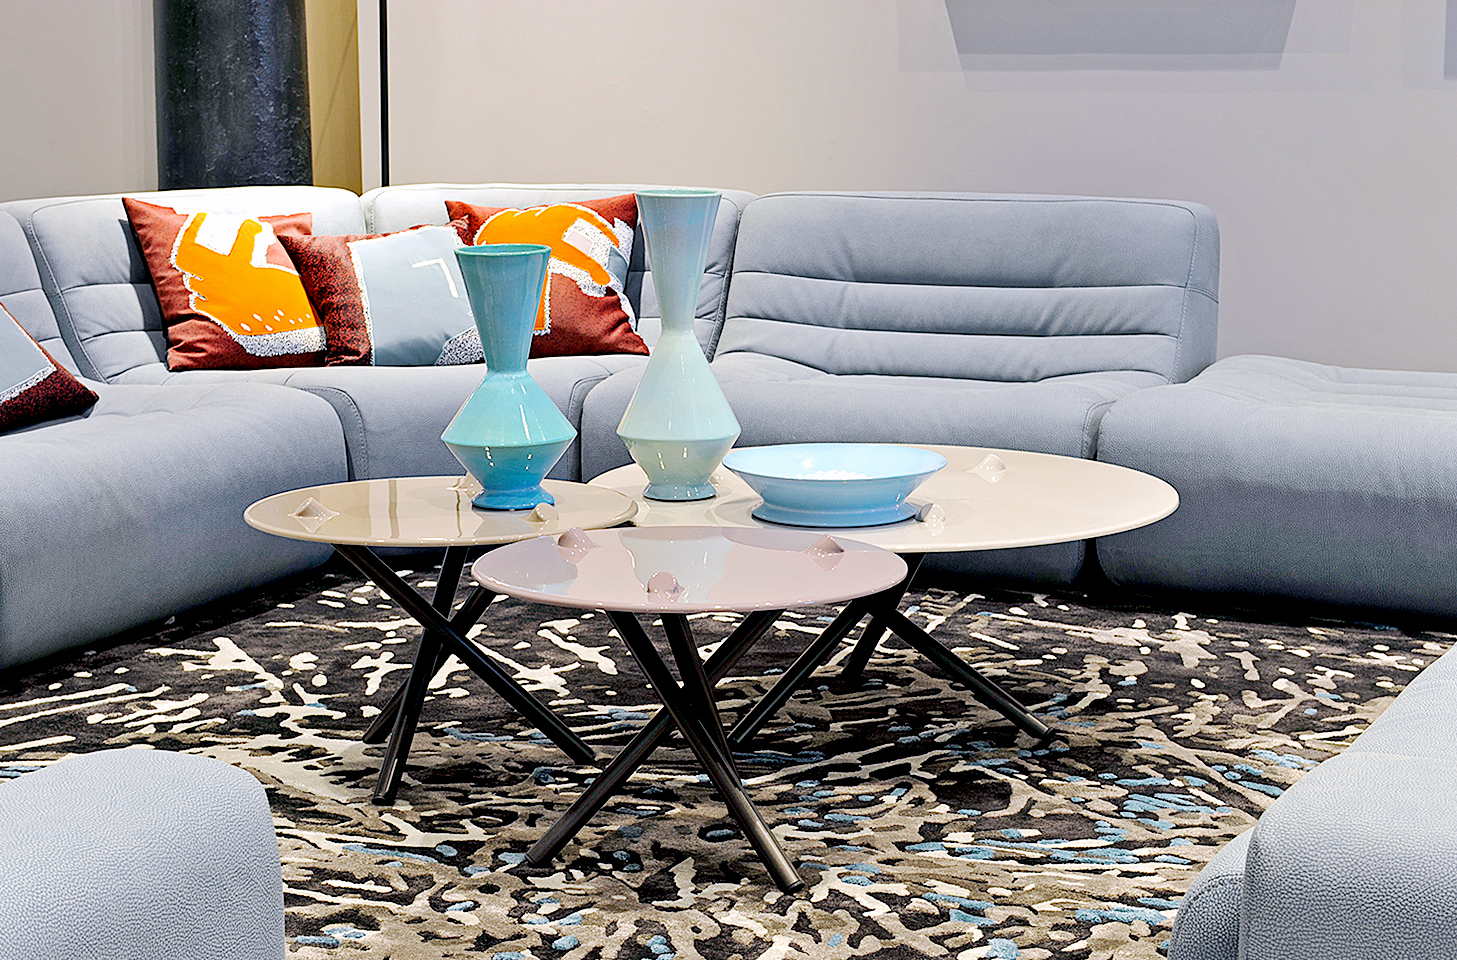 PUSH set de mesas — imagen cortesía de Roche Bobois